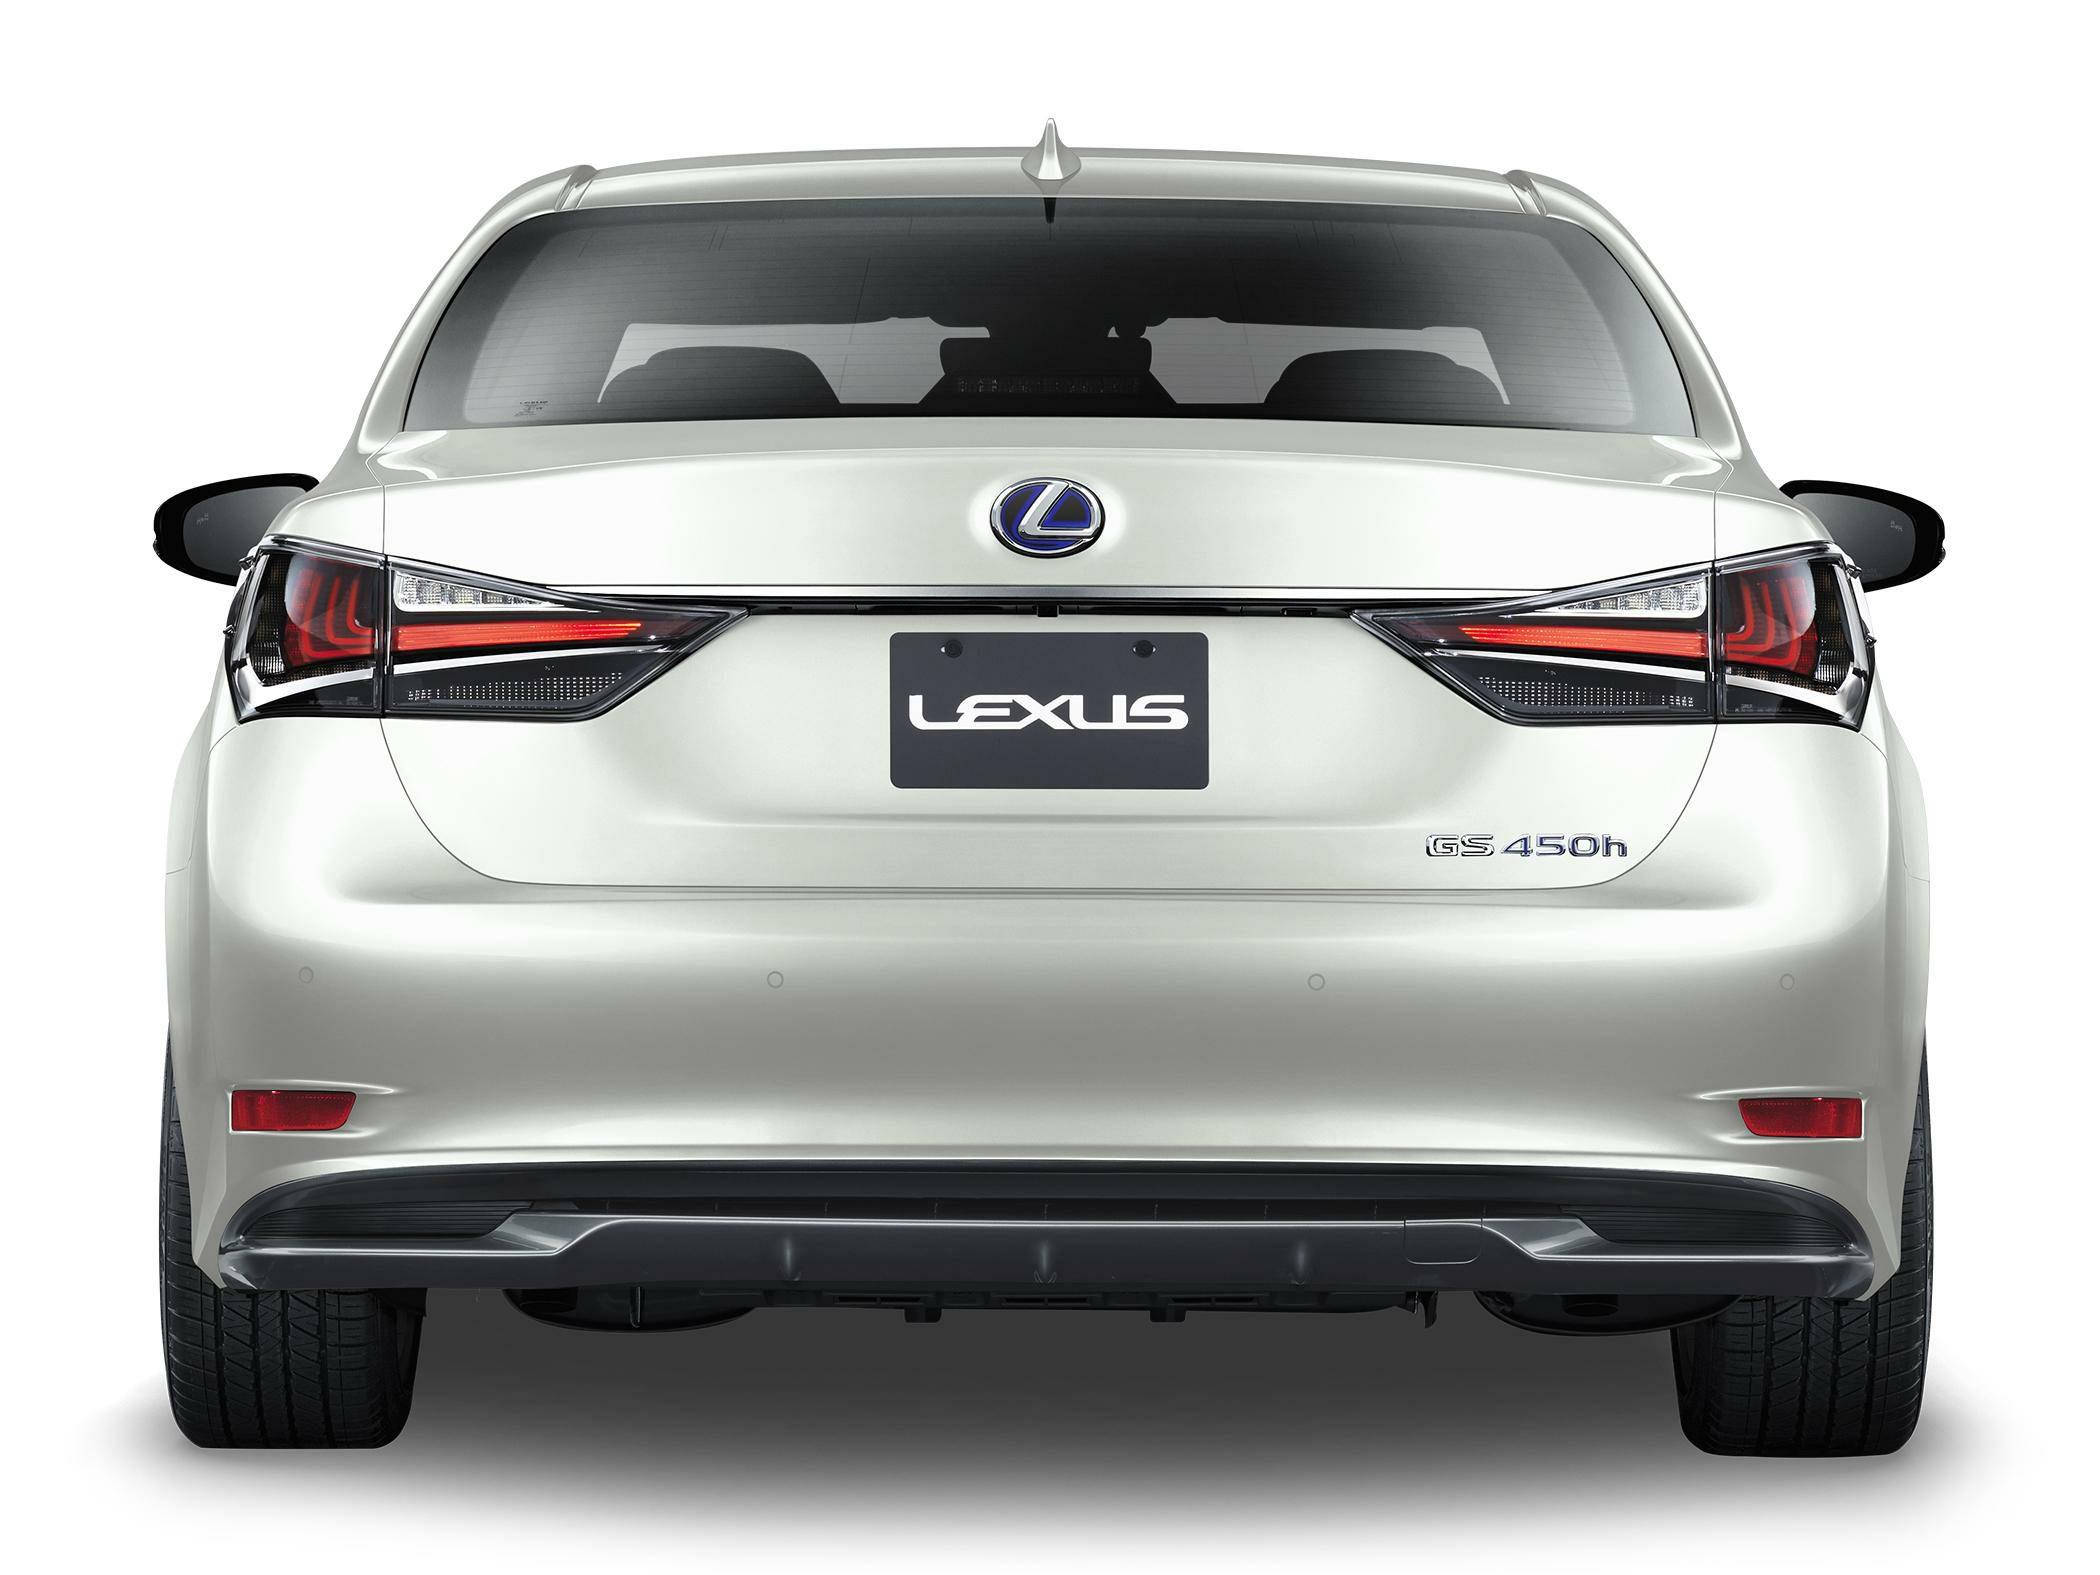 2017 Lexus GS 450h Base 4 Dr Sedan at Lexus of Lakeridge